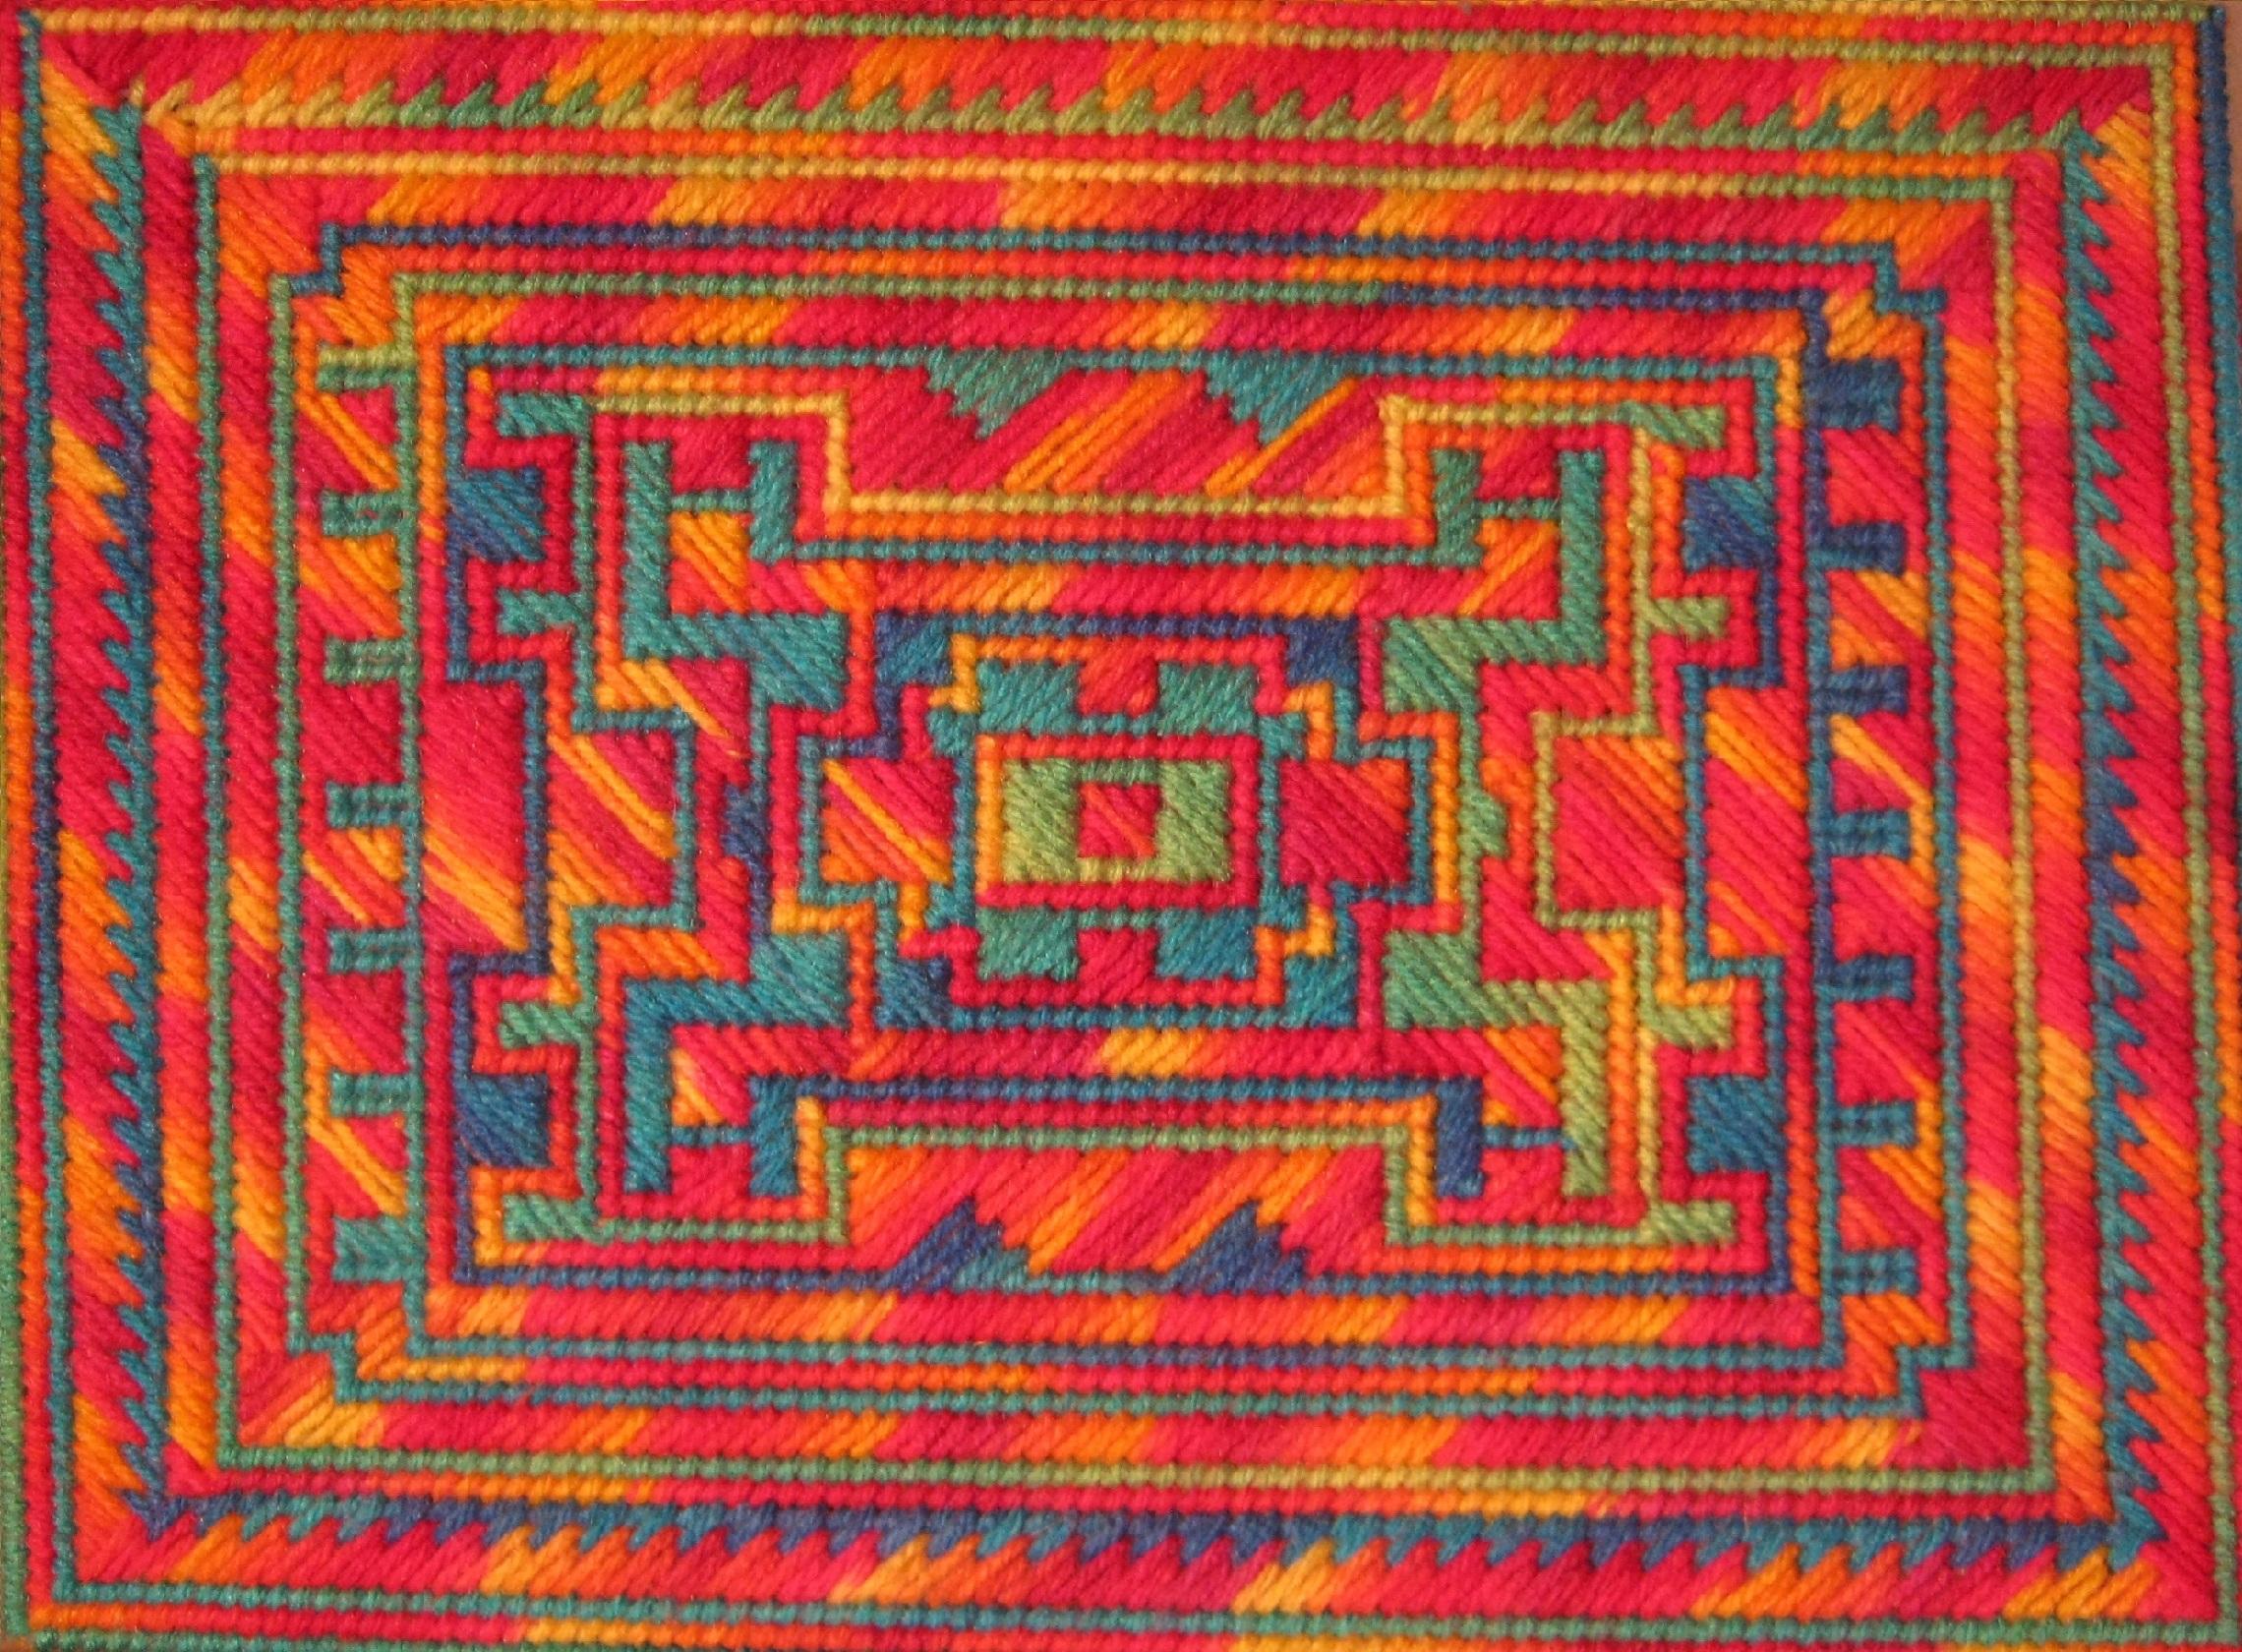 Beanie Baby rug